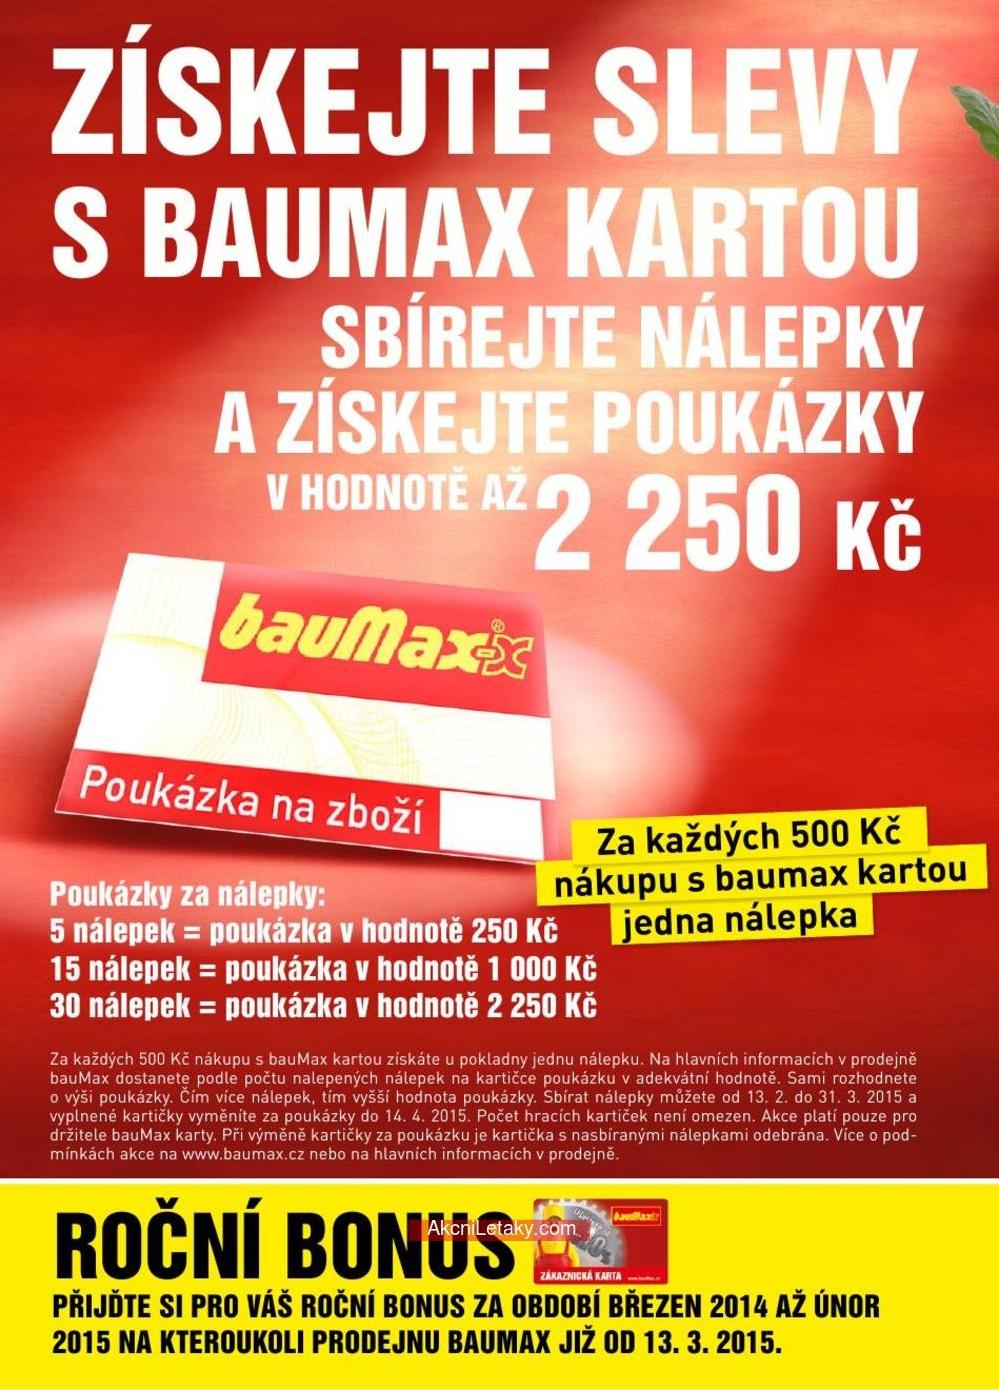 Baumax Letak Od 27 2 2015 Slevy Na Karty 999 36